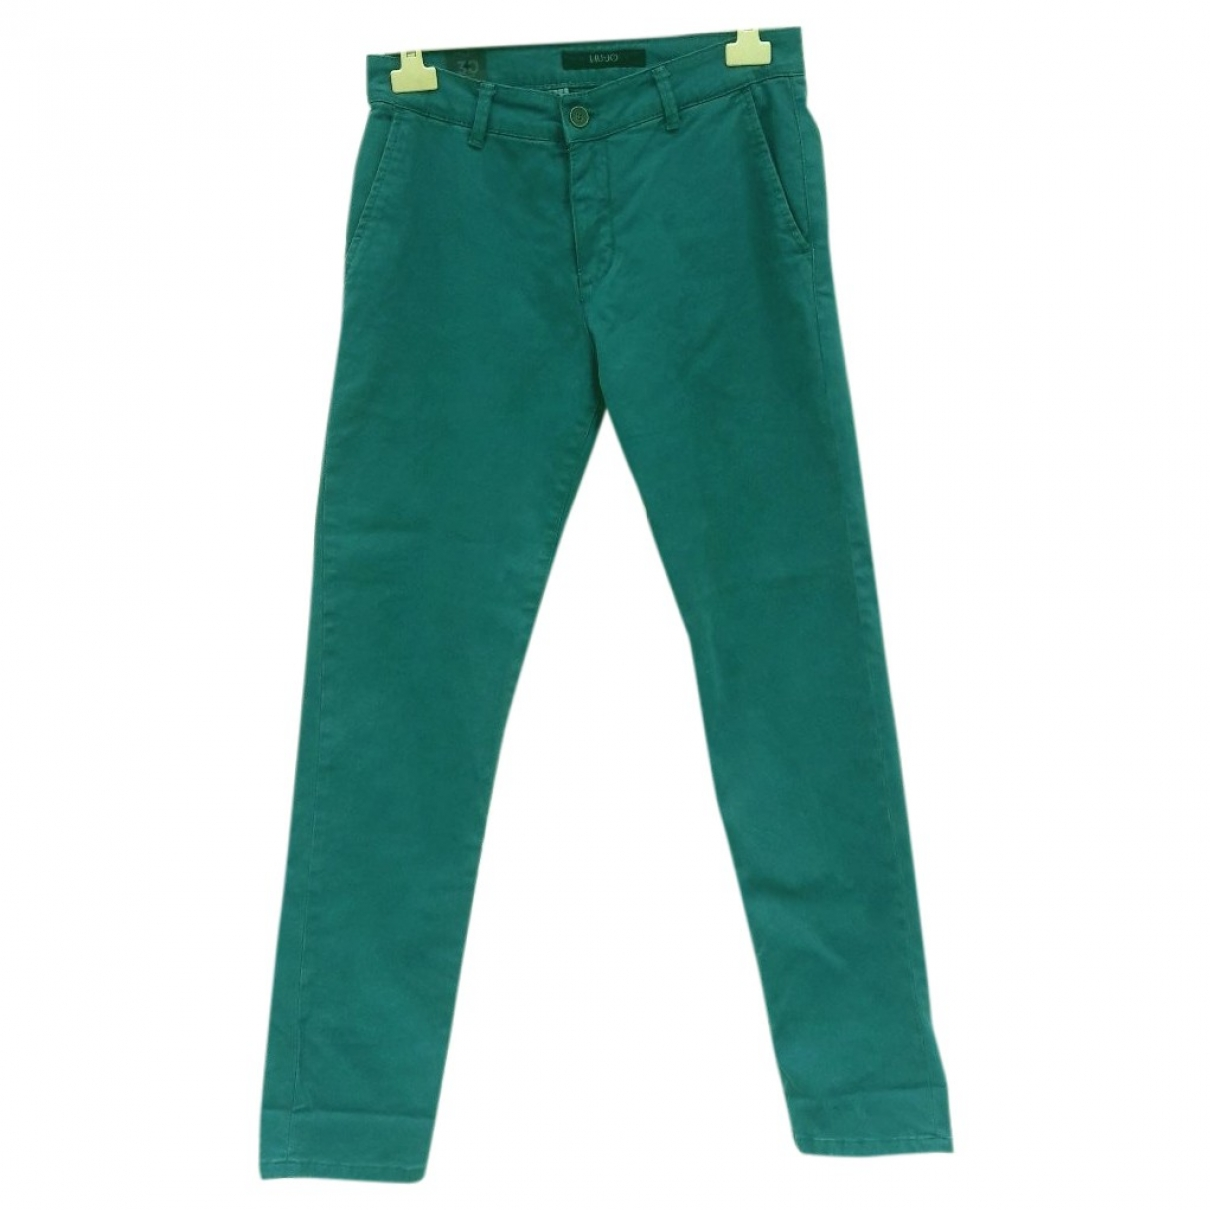 Liu.jo \N Green Cotton Trousers for Men 30 UK - US